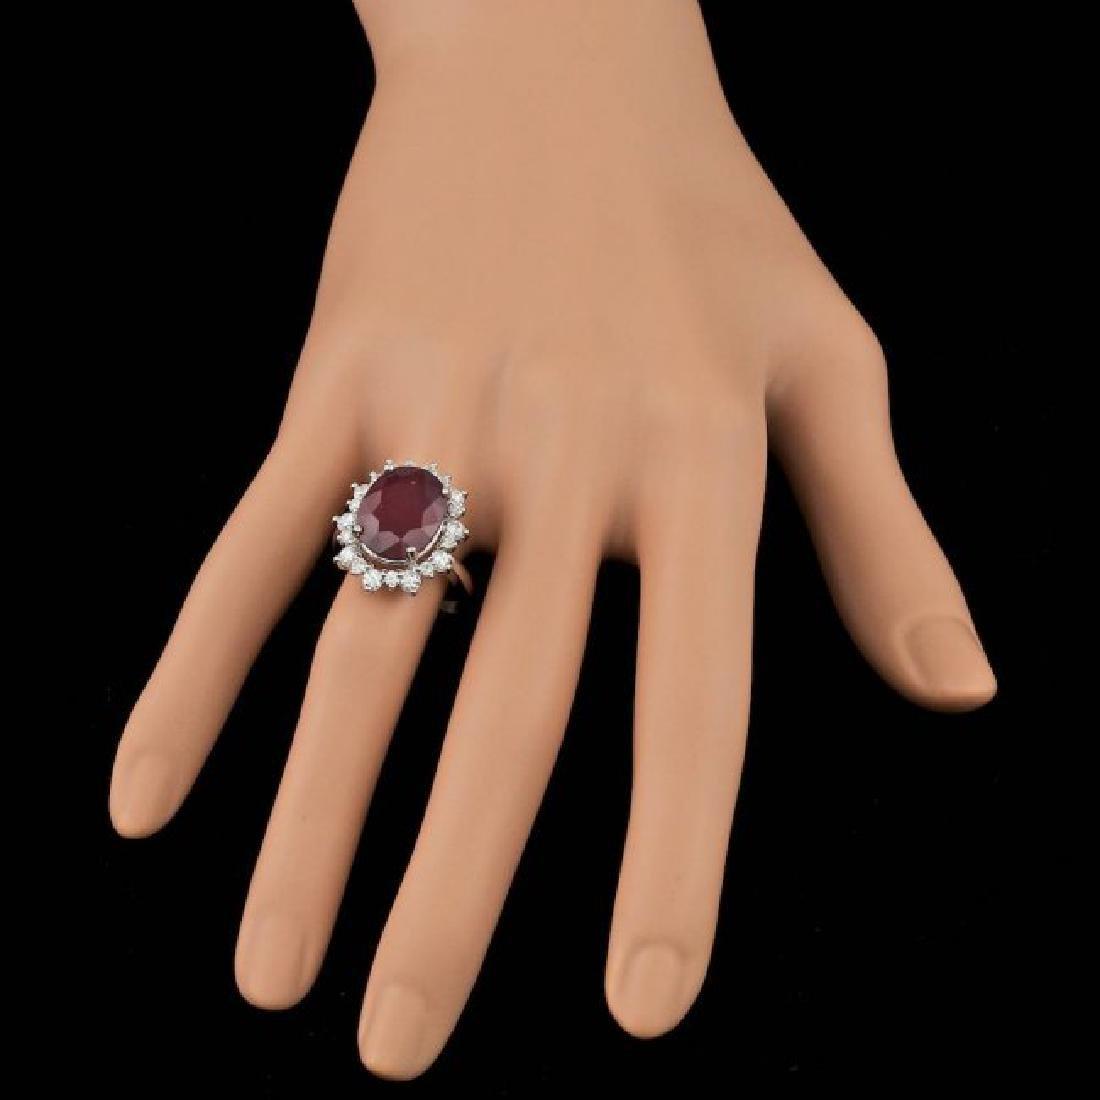 14k White Gold 11.00ct Ruby 1.15ct Diamond Ring - 3